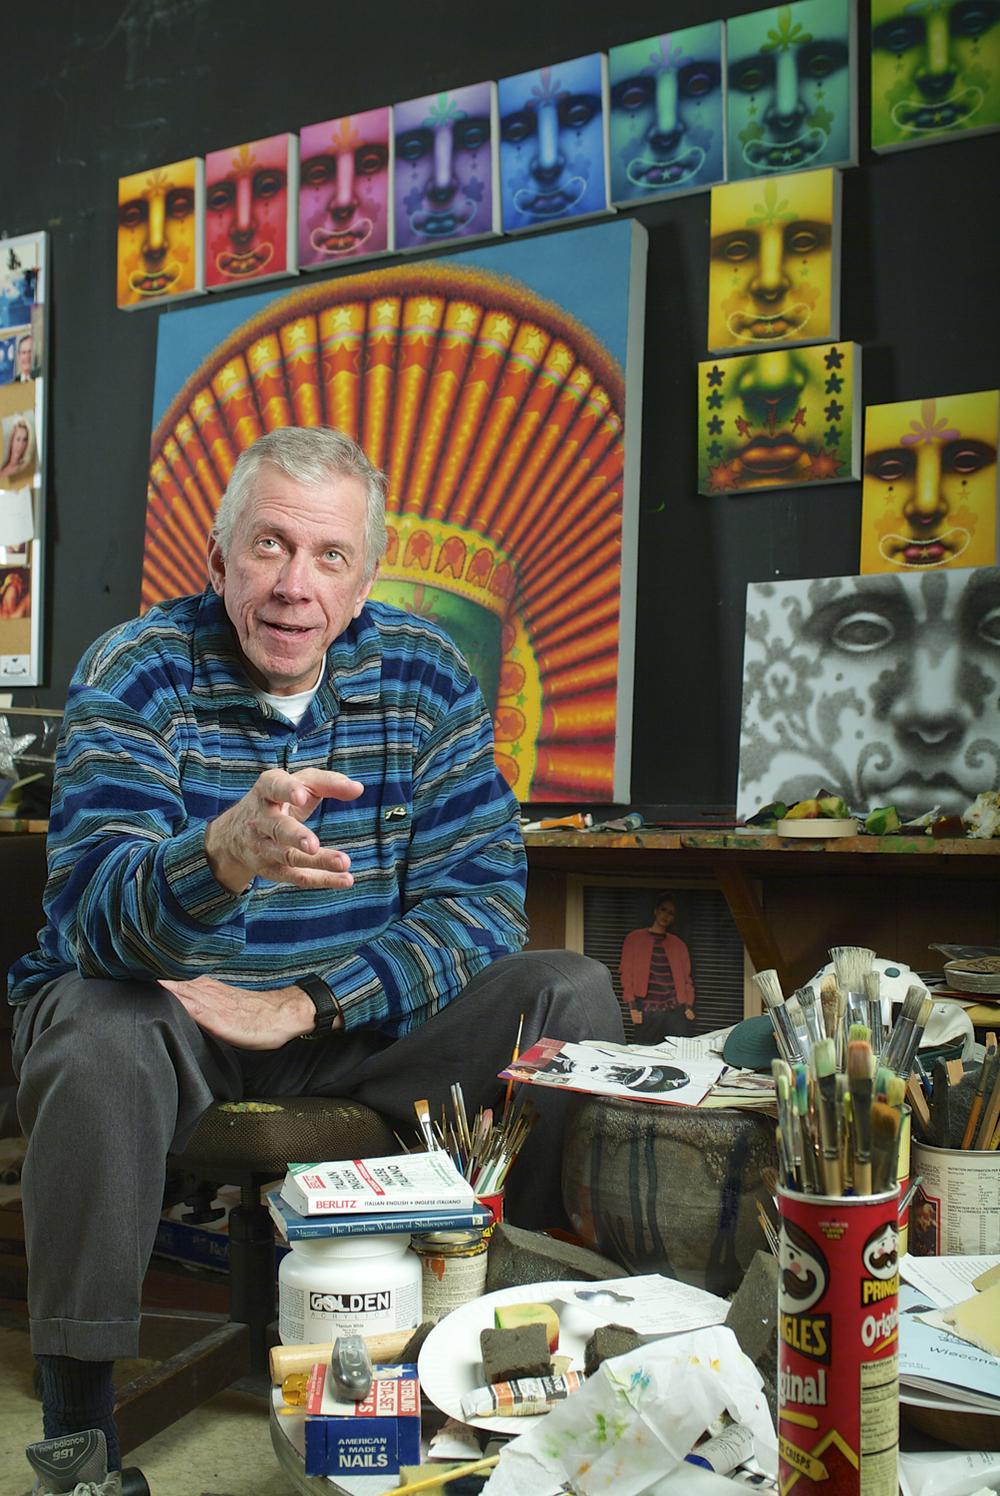 Ed Paschke, Painter